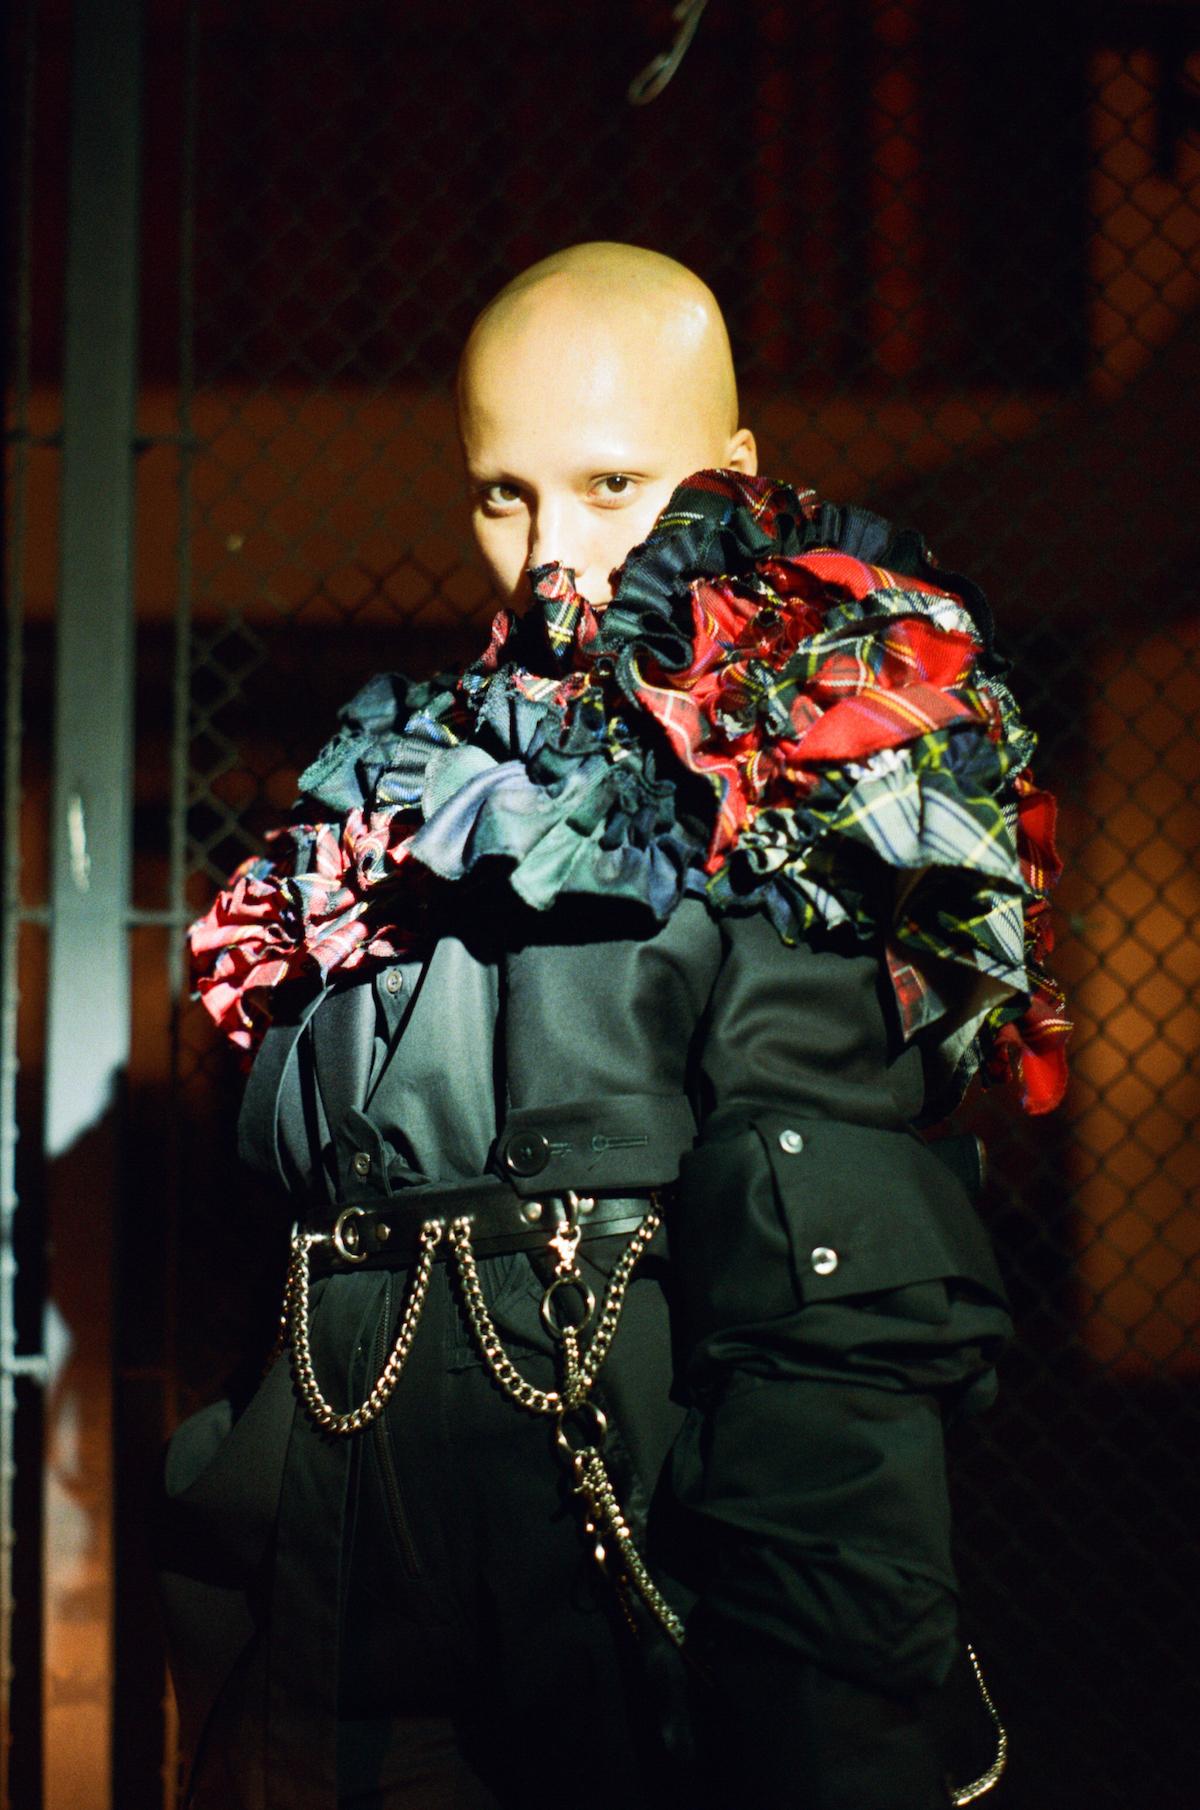 Teeth Magazine Online Editorial Film Fashion Photography Katy Shayne Junya Watanabe Comme des Garçons